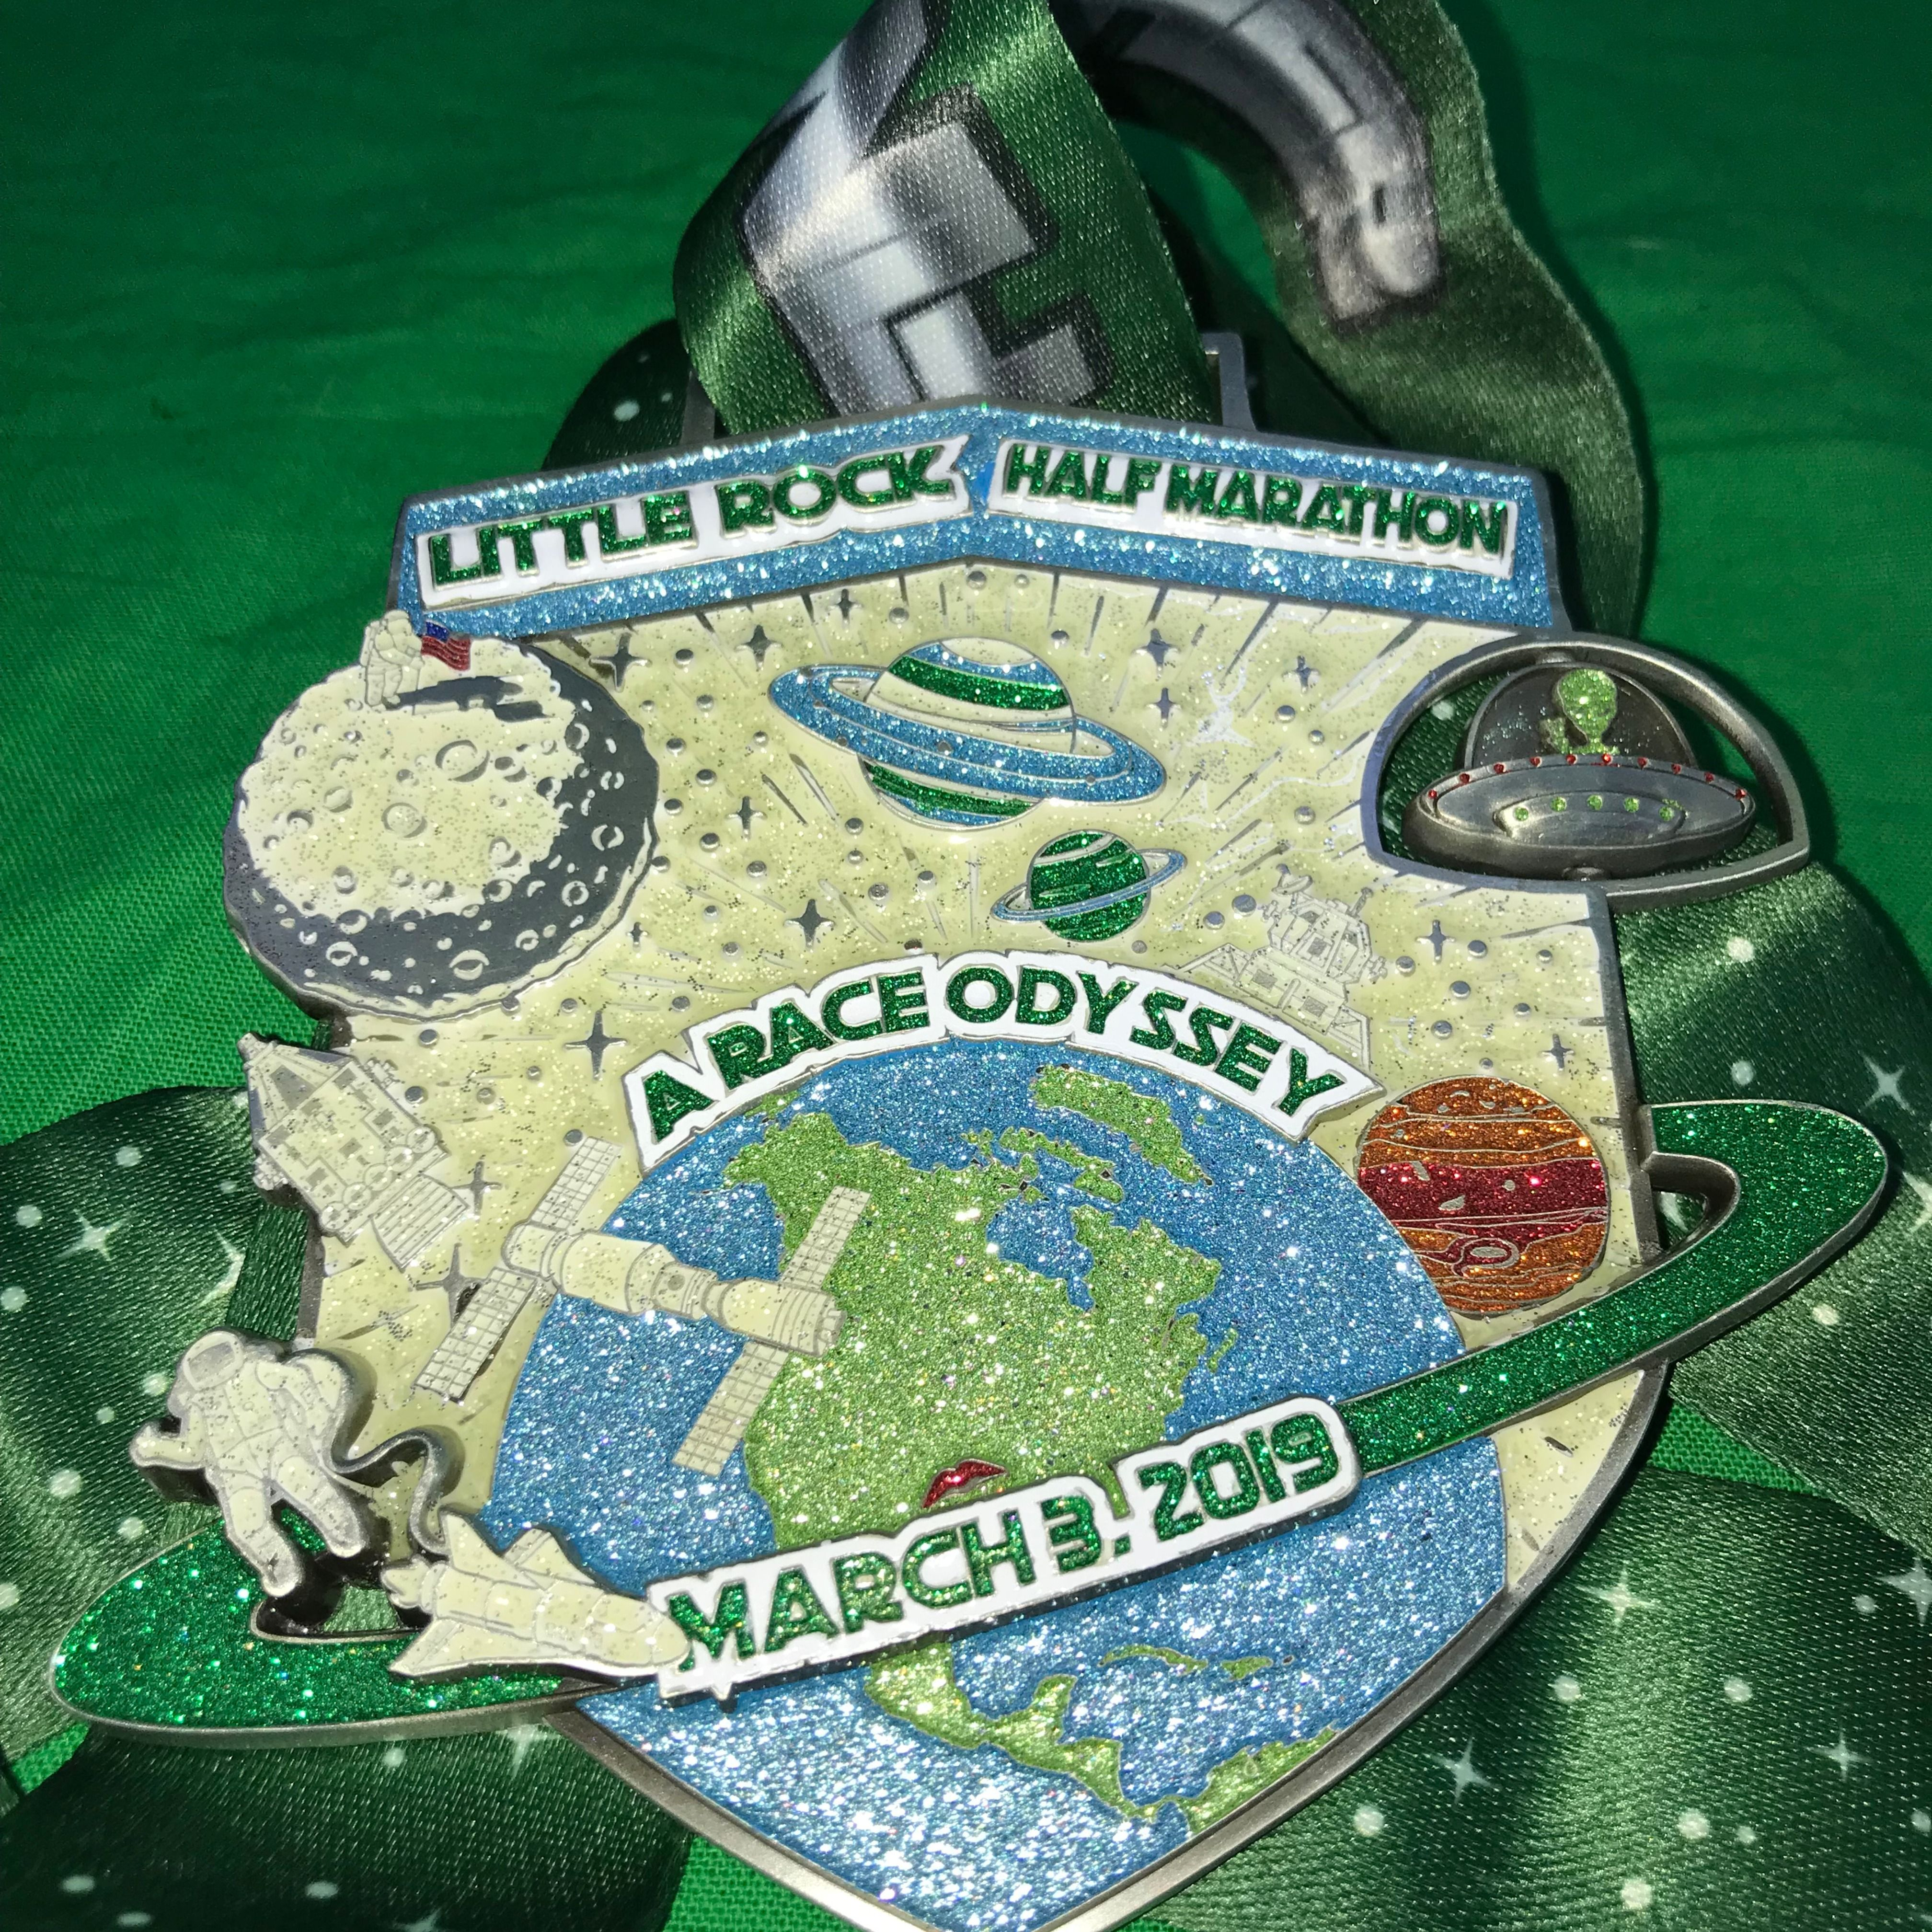 2019 LRMarathon Medals Medals, Personalized items, Dollar